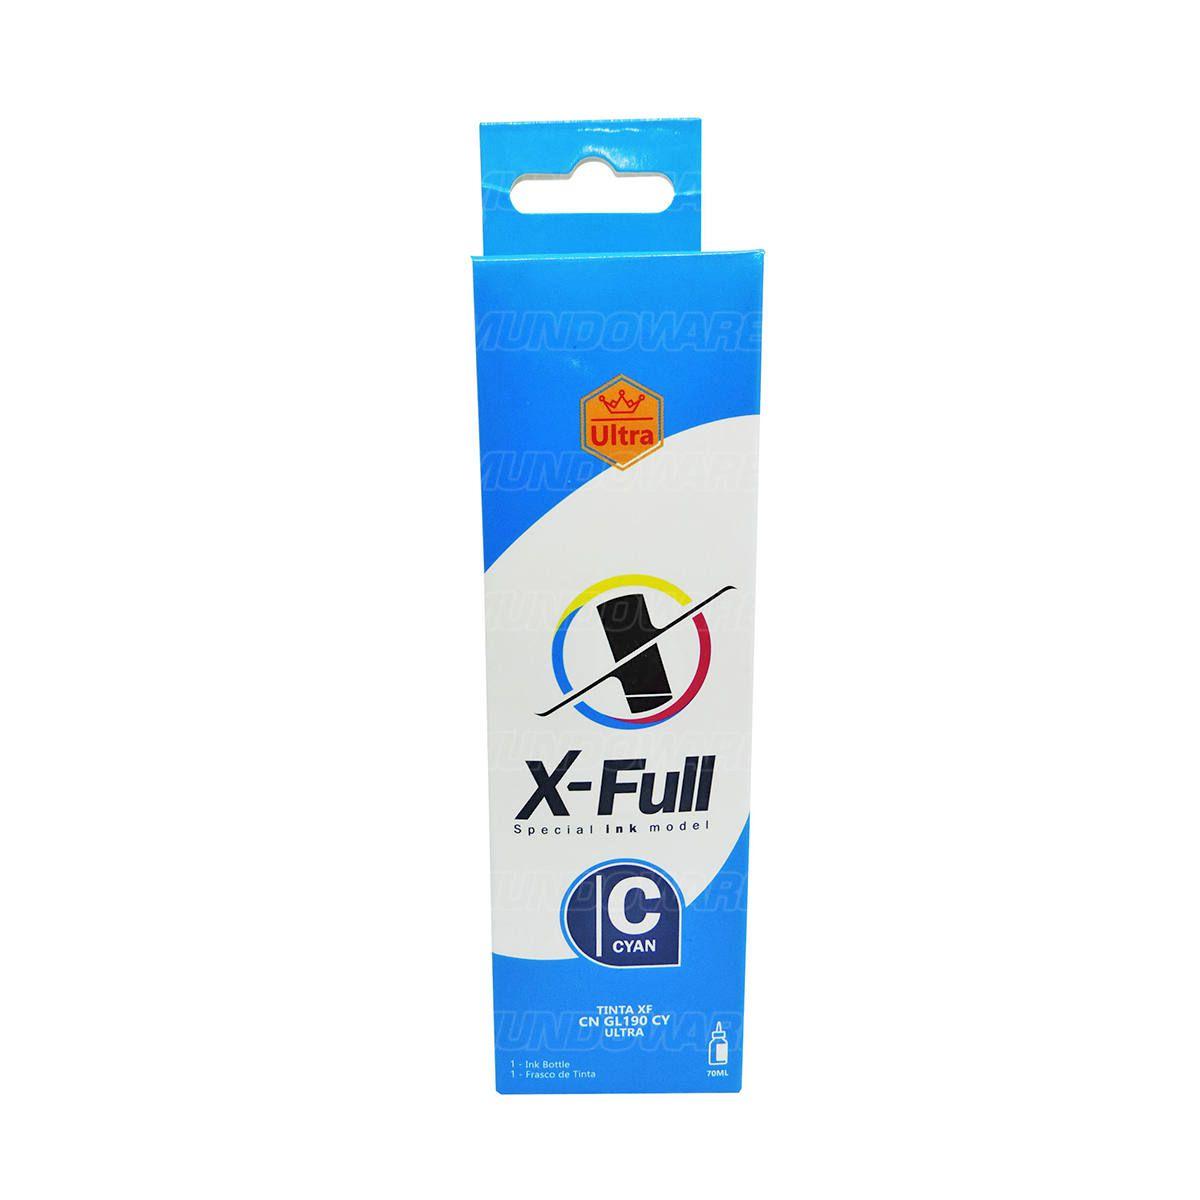 Tinta X-Full Corante Ultra para Impressora Canon G Series G3800 G3100 G1800 G1900 com Bico Aplicador / 70ml / Ciano